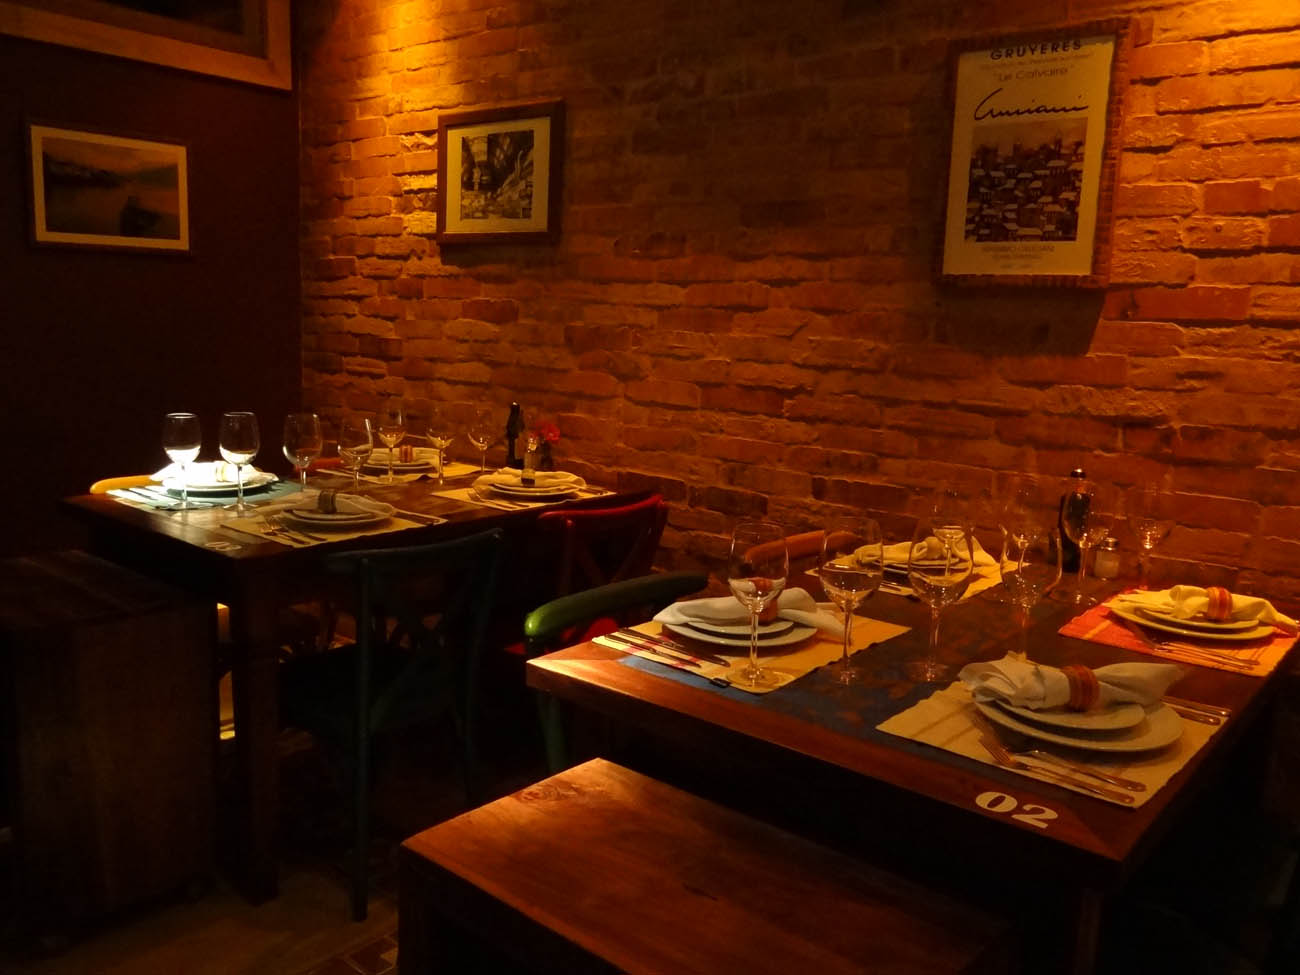 Malbec Restaurante Mapa de Gramado. Foto: Bárbara Keller #BC4703 1300x975